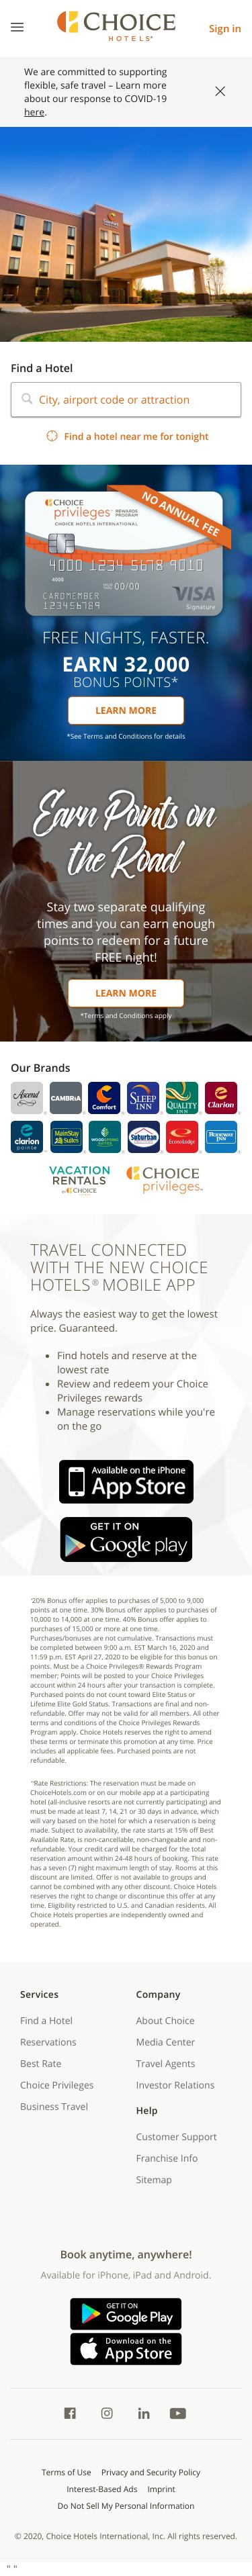 Choice Hotels Coupon